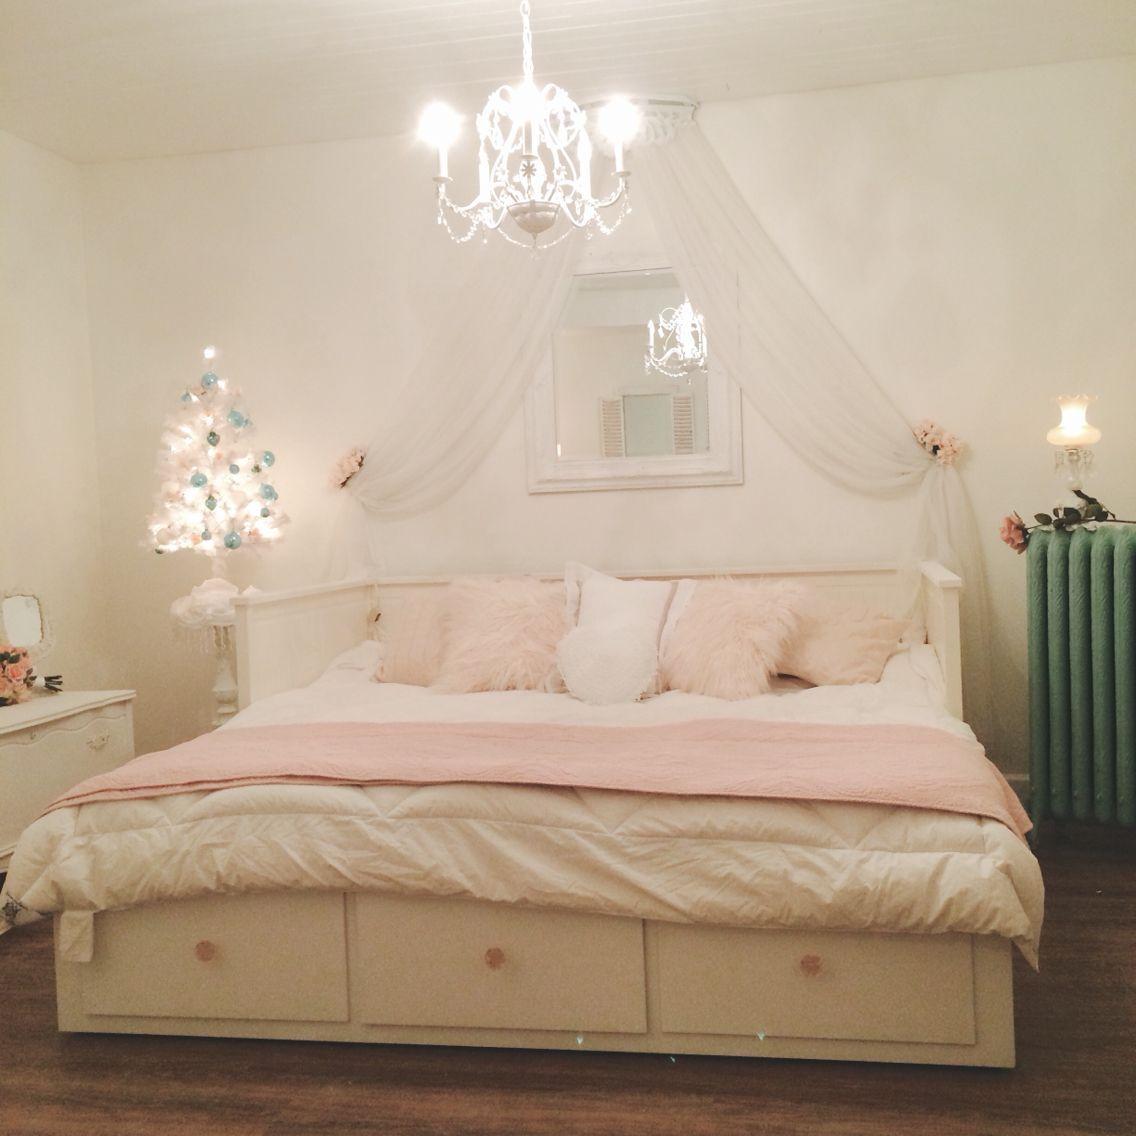 Best Pin By Mackenzie Filson On Barbie Dream Room Ikea 640 x 480